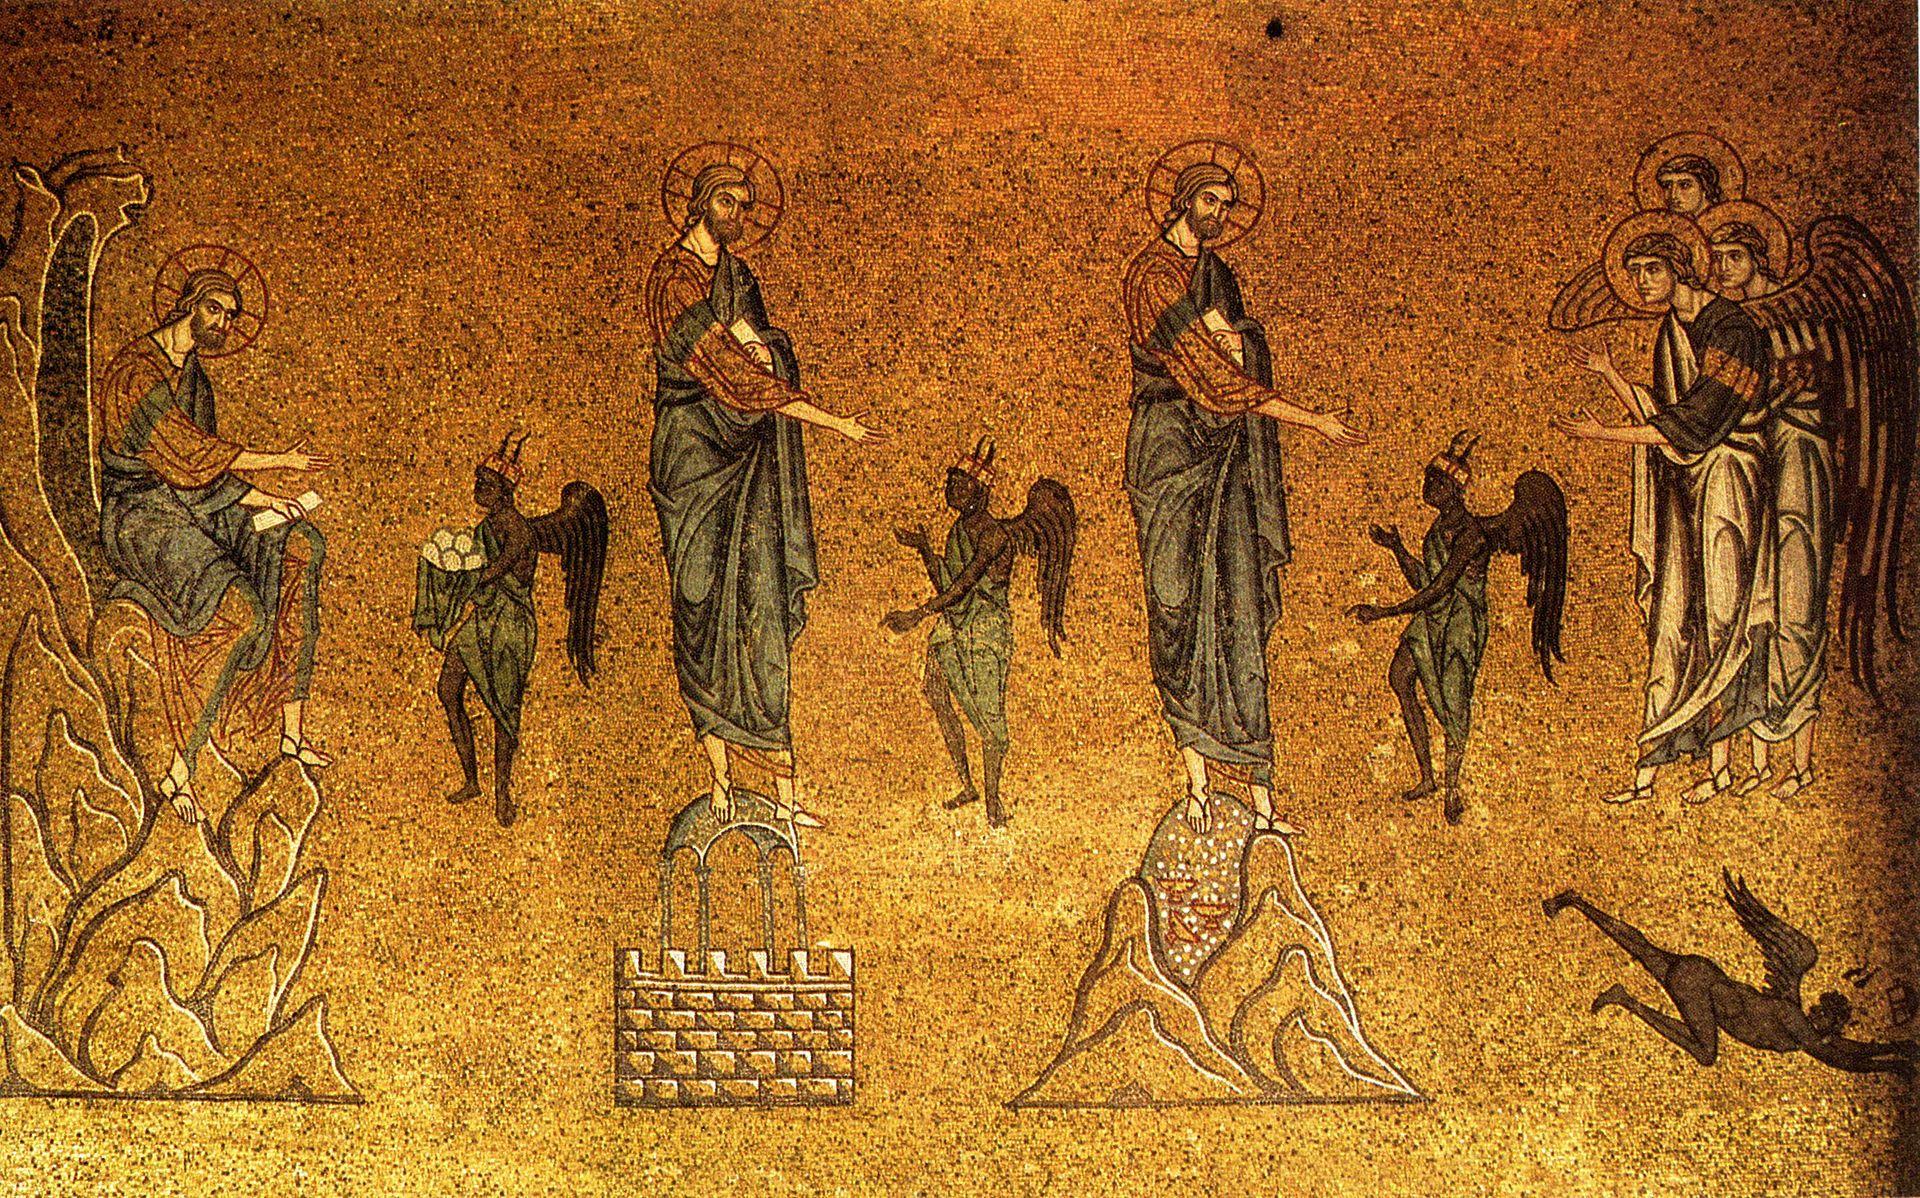 Die Versuchungen Christi, Mosaik aus dem 13. Jahrhundert im Markusdom (Venedig)